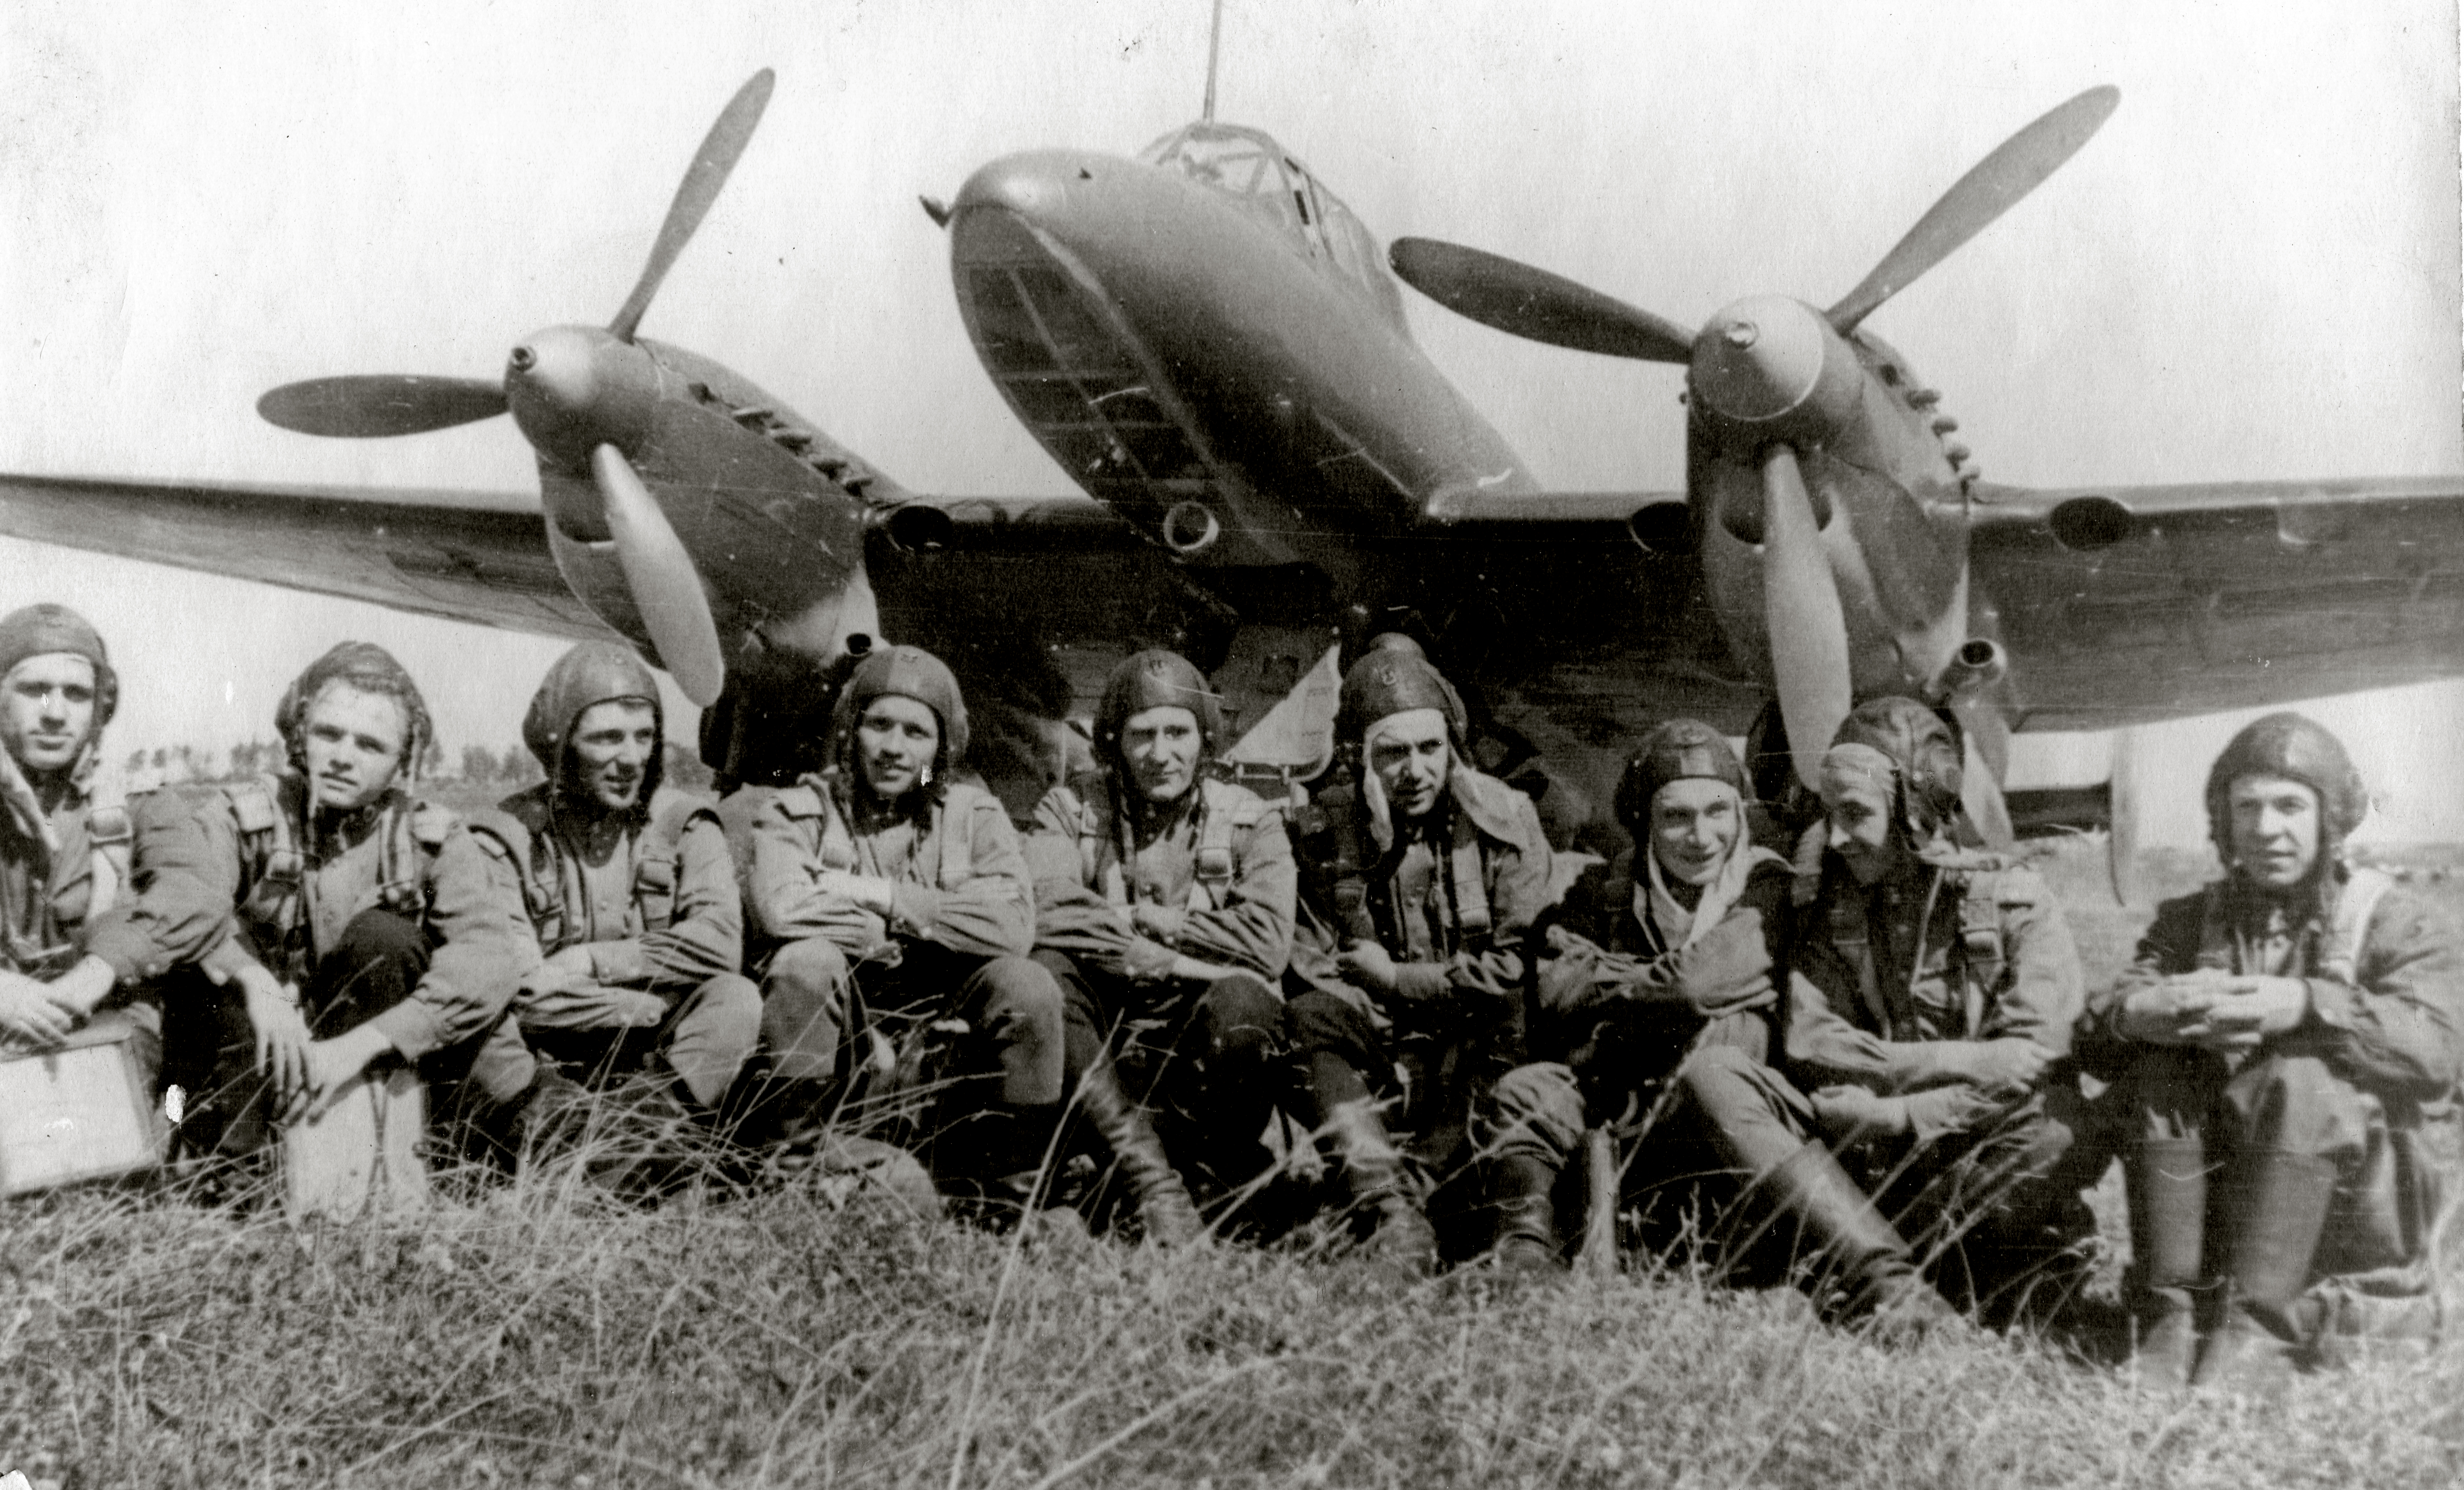 Aircrew Soviet 127GvBAP with crews Stalingrad front 01